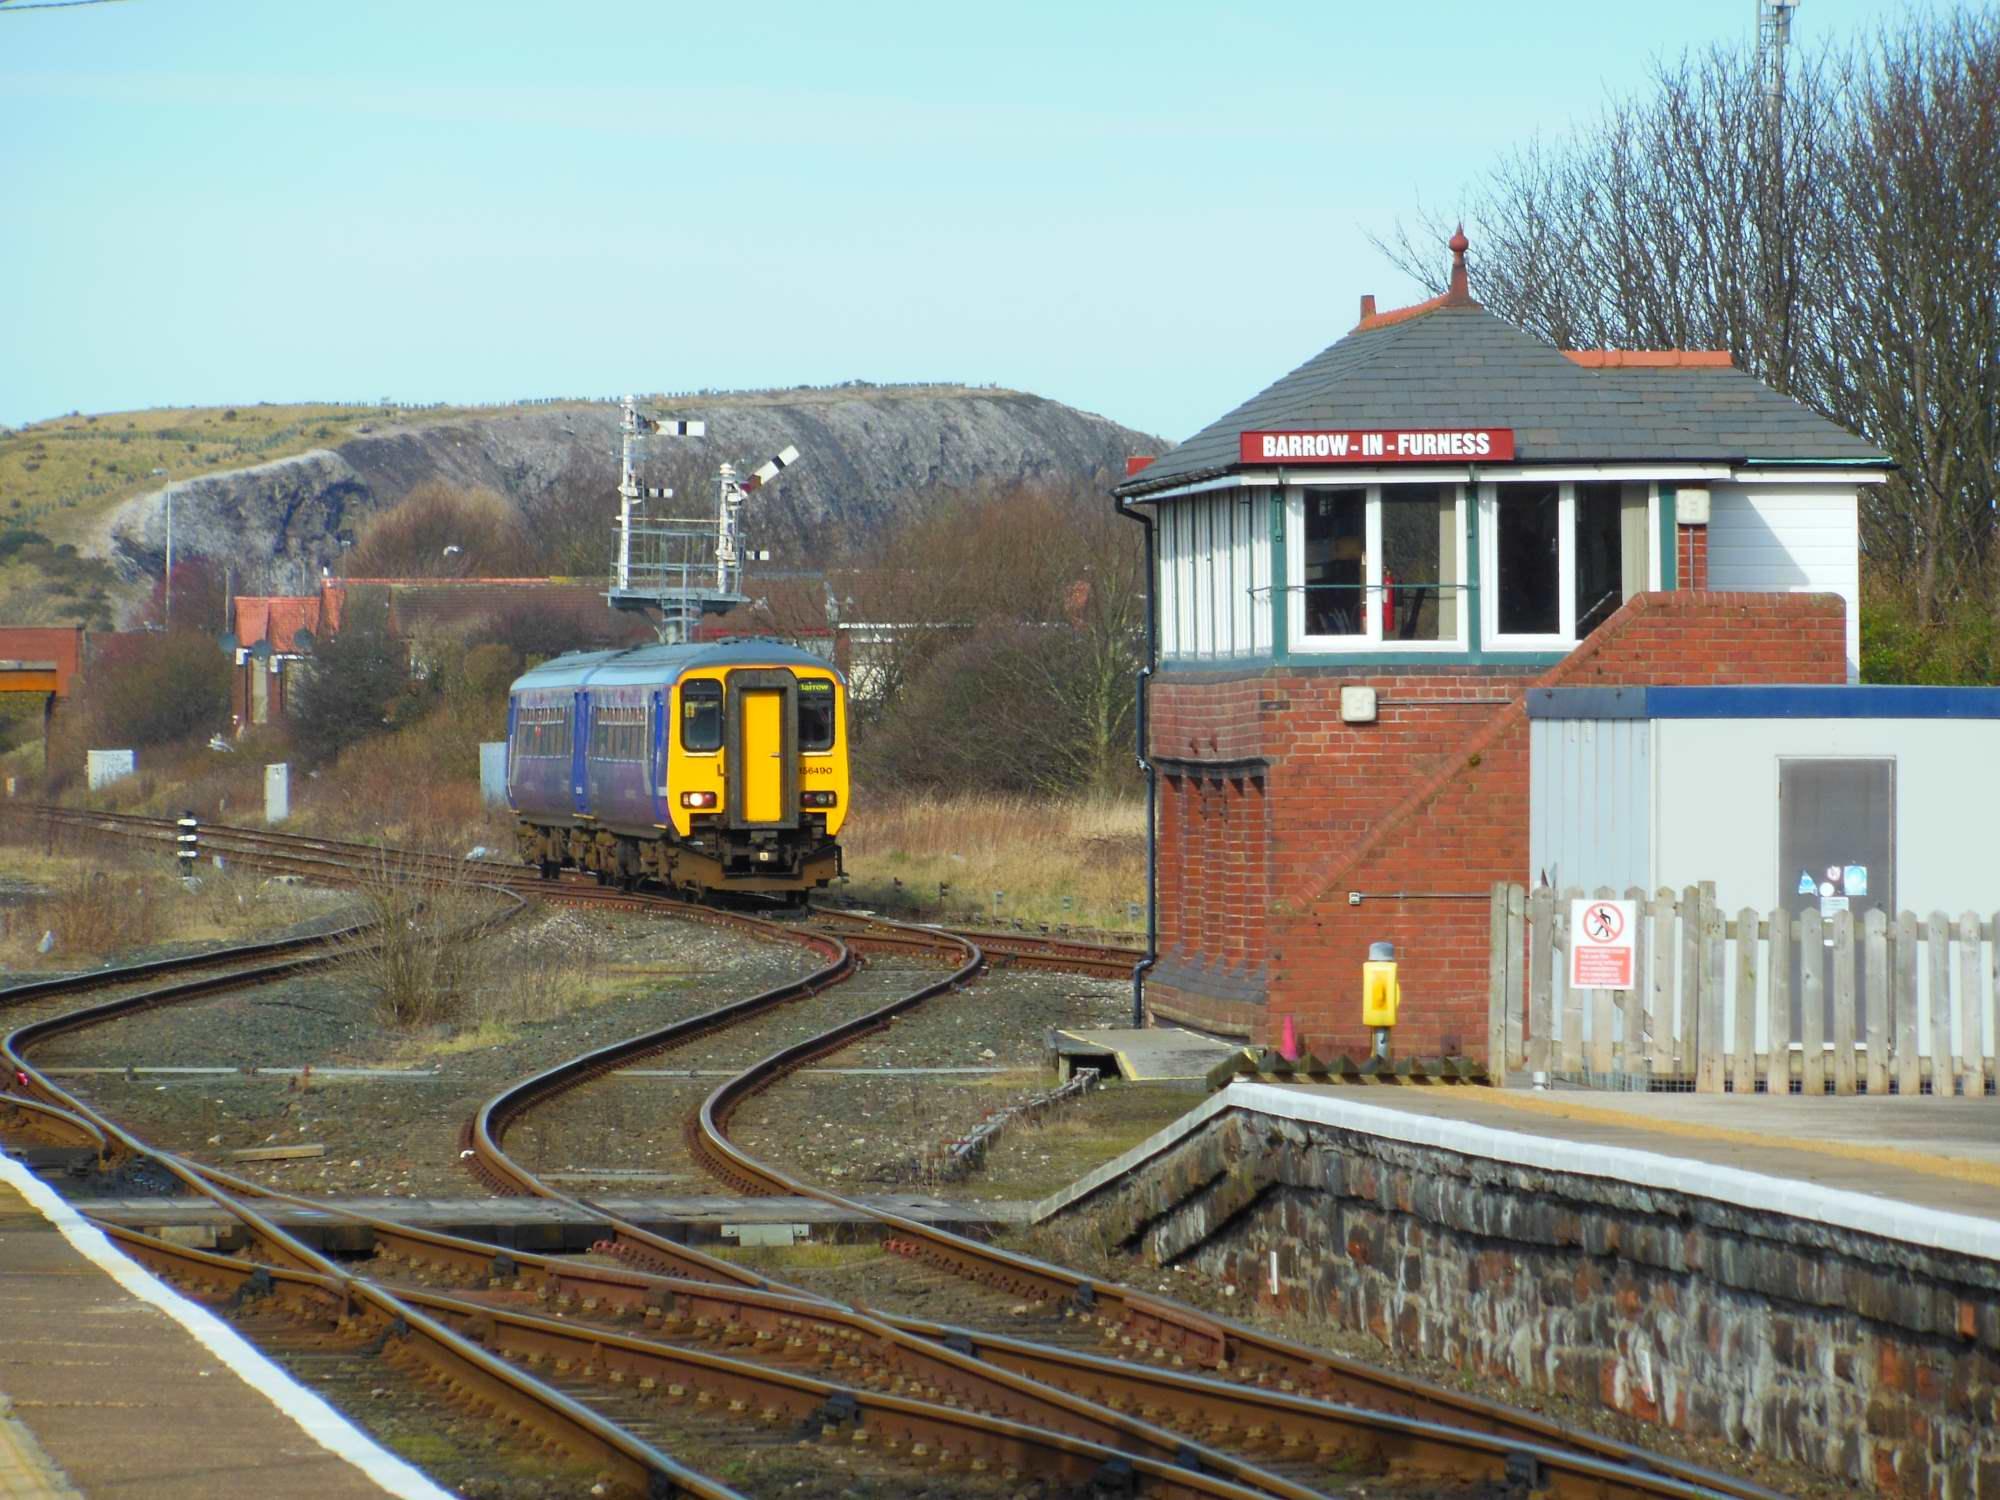 156 Approaching Barrow-in-Furness